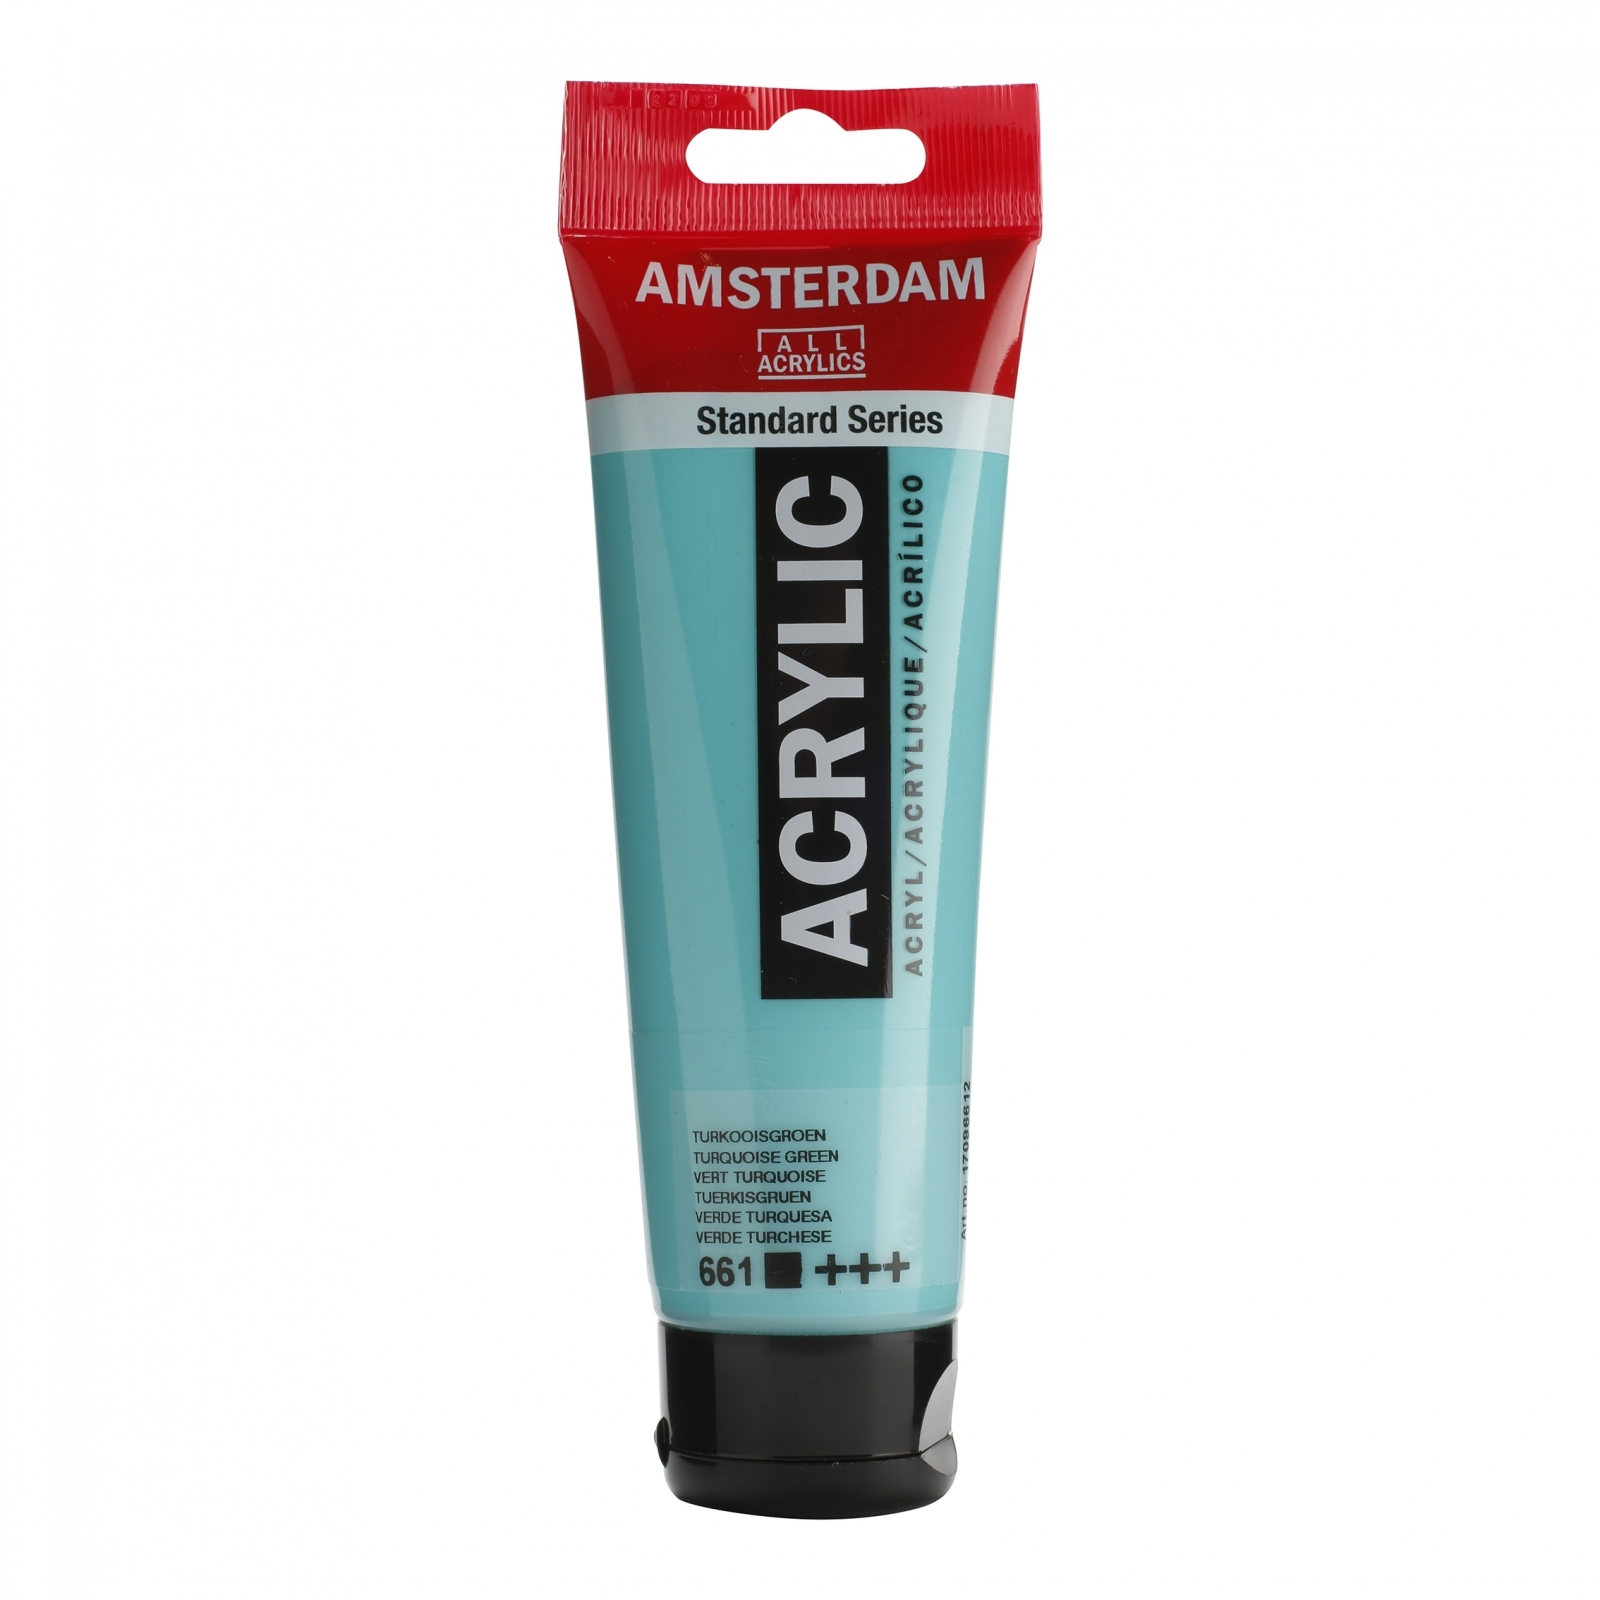 Tinta Acrílica Amsterdam Turquoise green 120ml (+++661) - Papelaria Botafogo